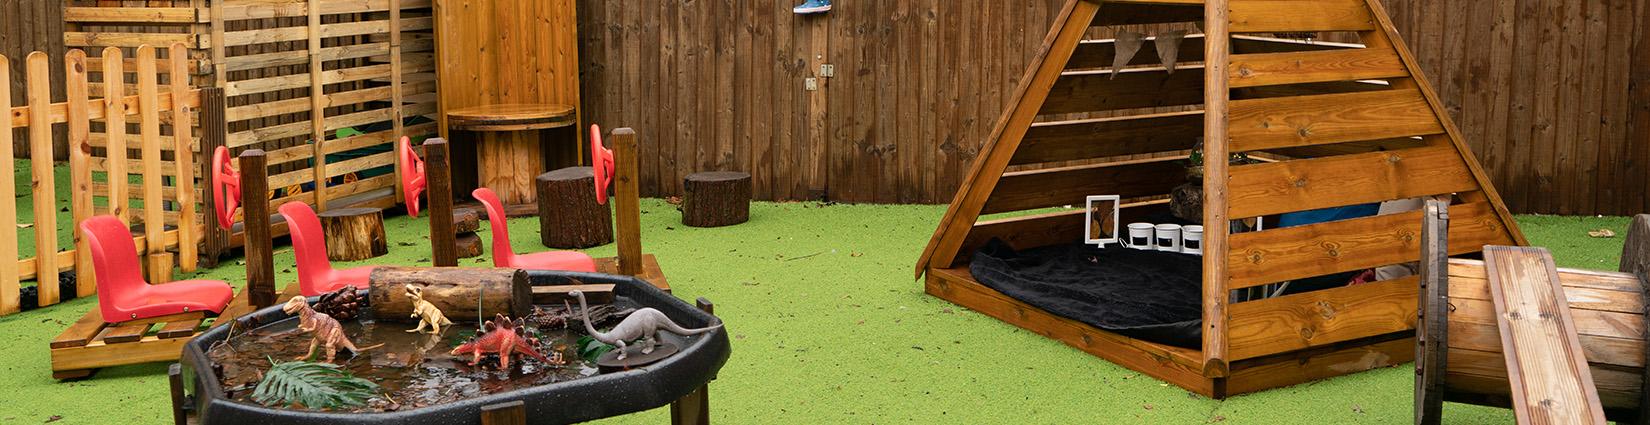 little hands daycare Stourbridge outside play area